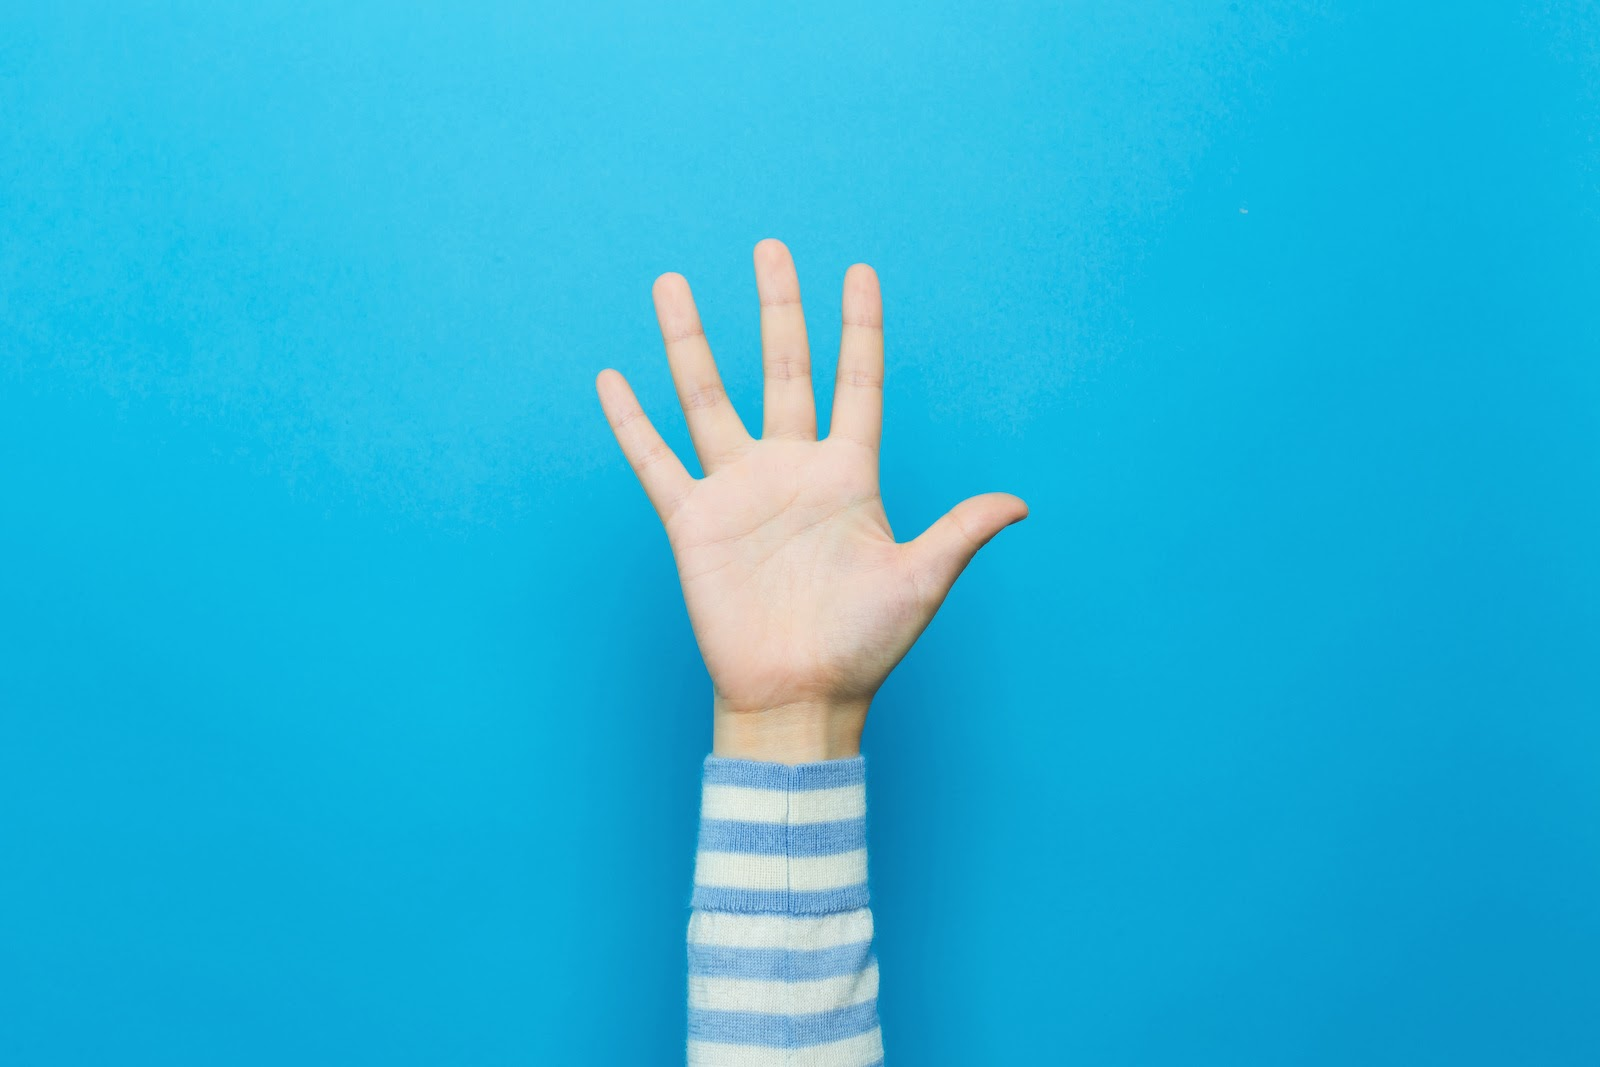 A person raises their hand to participate at a virtual convention